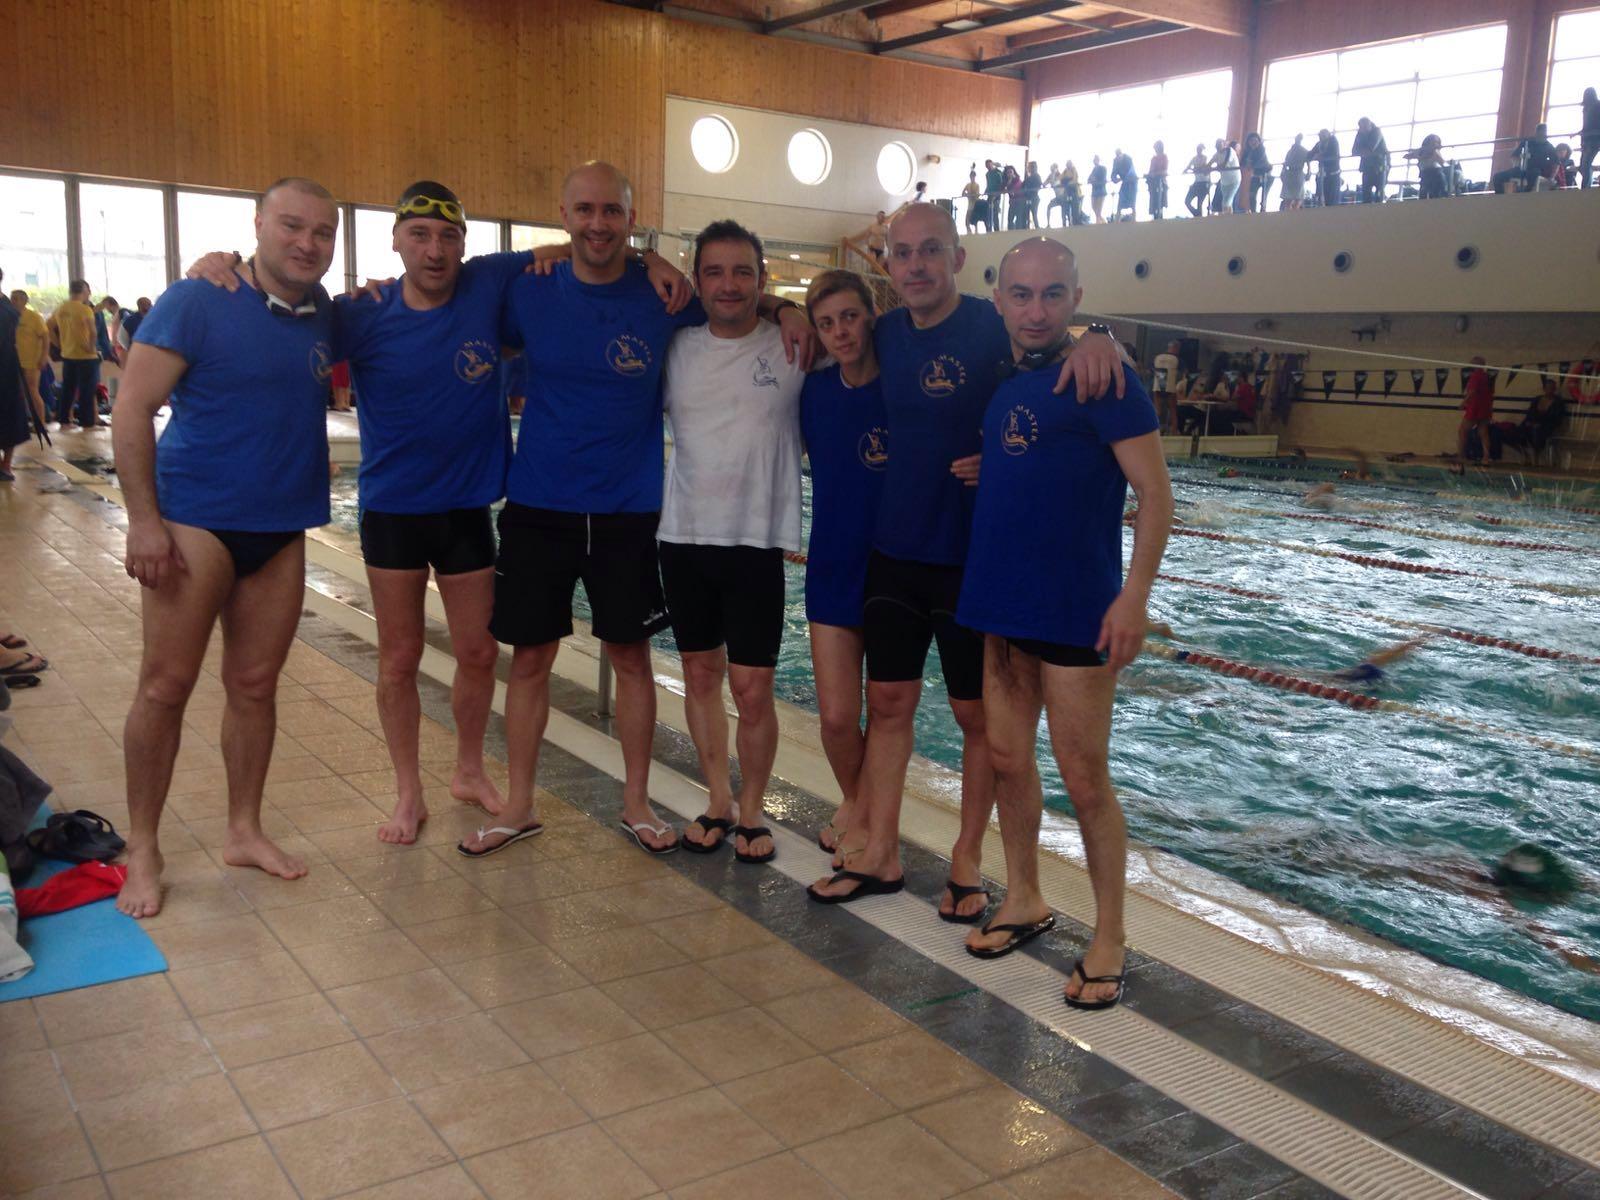 Calendario Supermaster.Circuito Supermaster Catanzaro Nuoto A Putignano